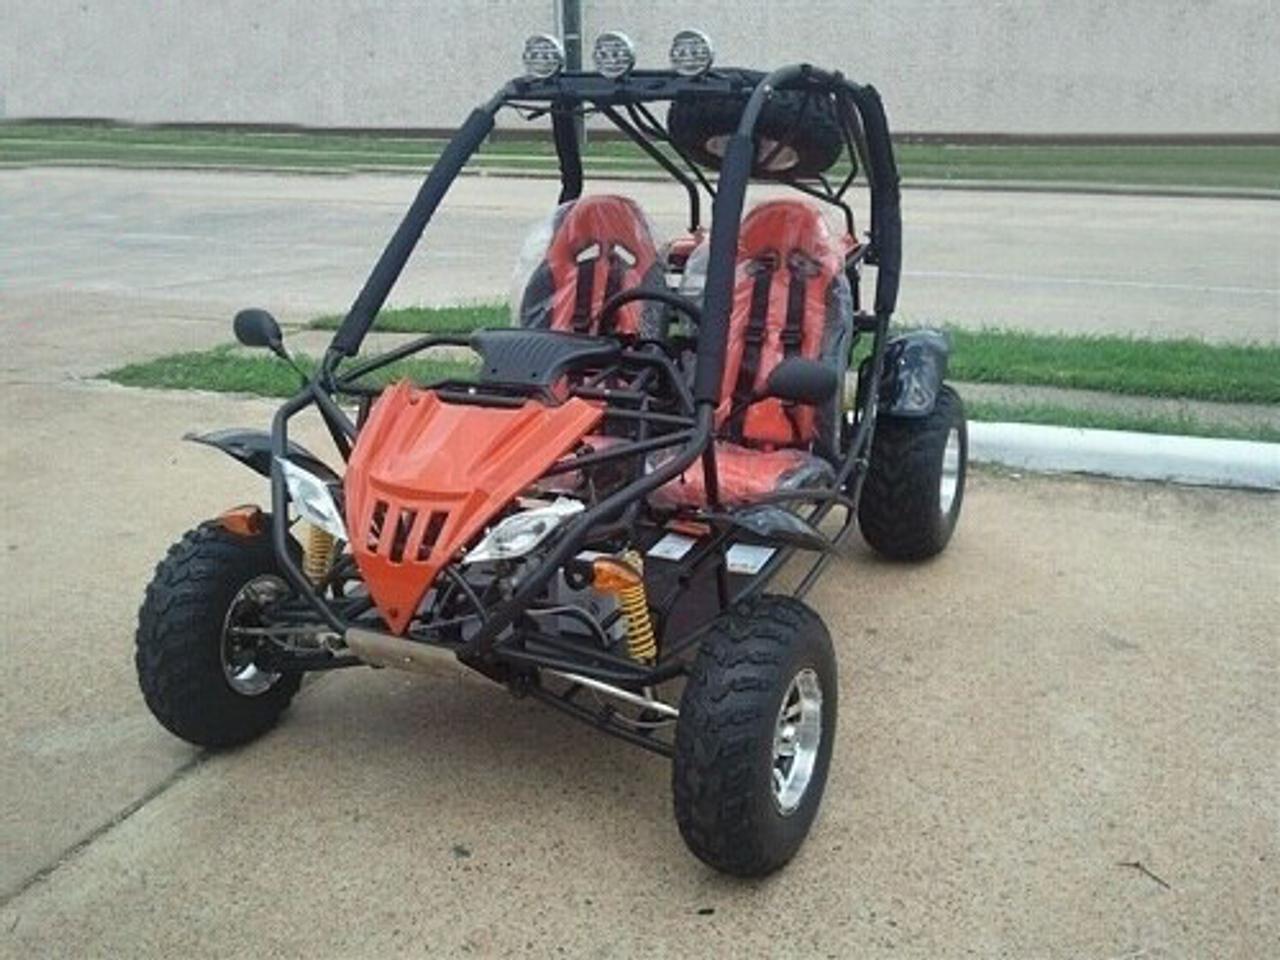 Vitacci JAGUAR-200 (169cc) DELUXE Go Kart, Single-Cylinder, 4-Stroke, Horizontal Type, Air-Cooled